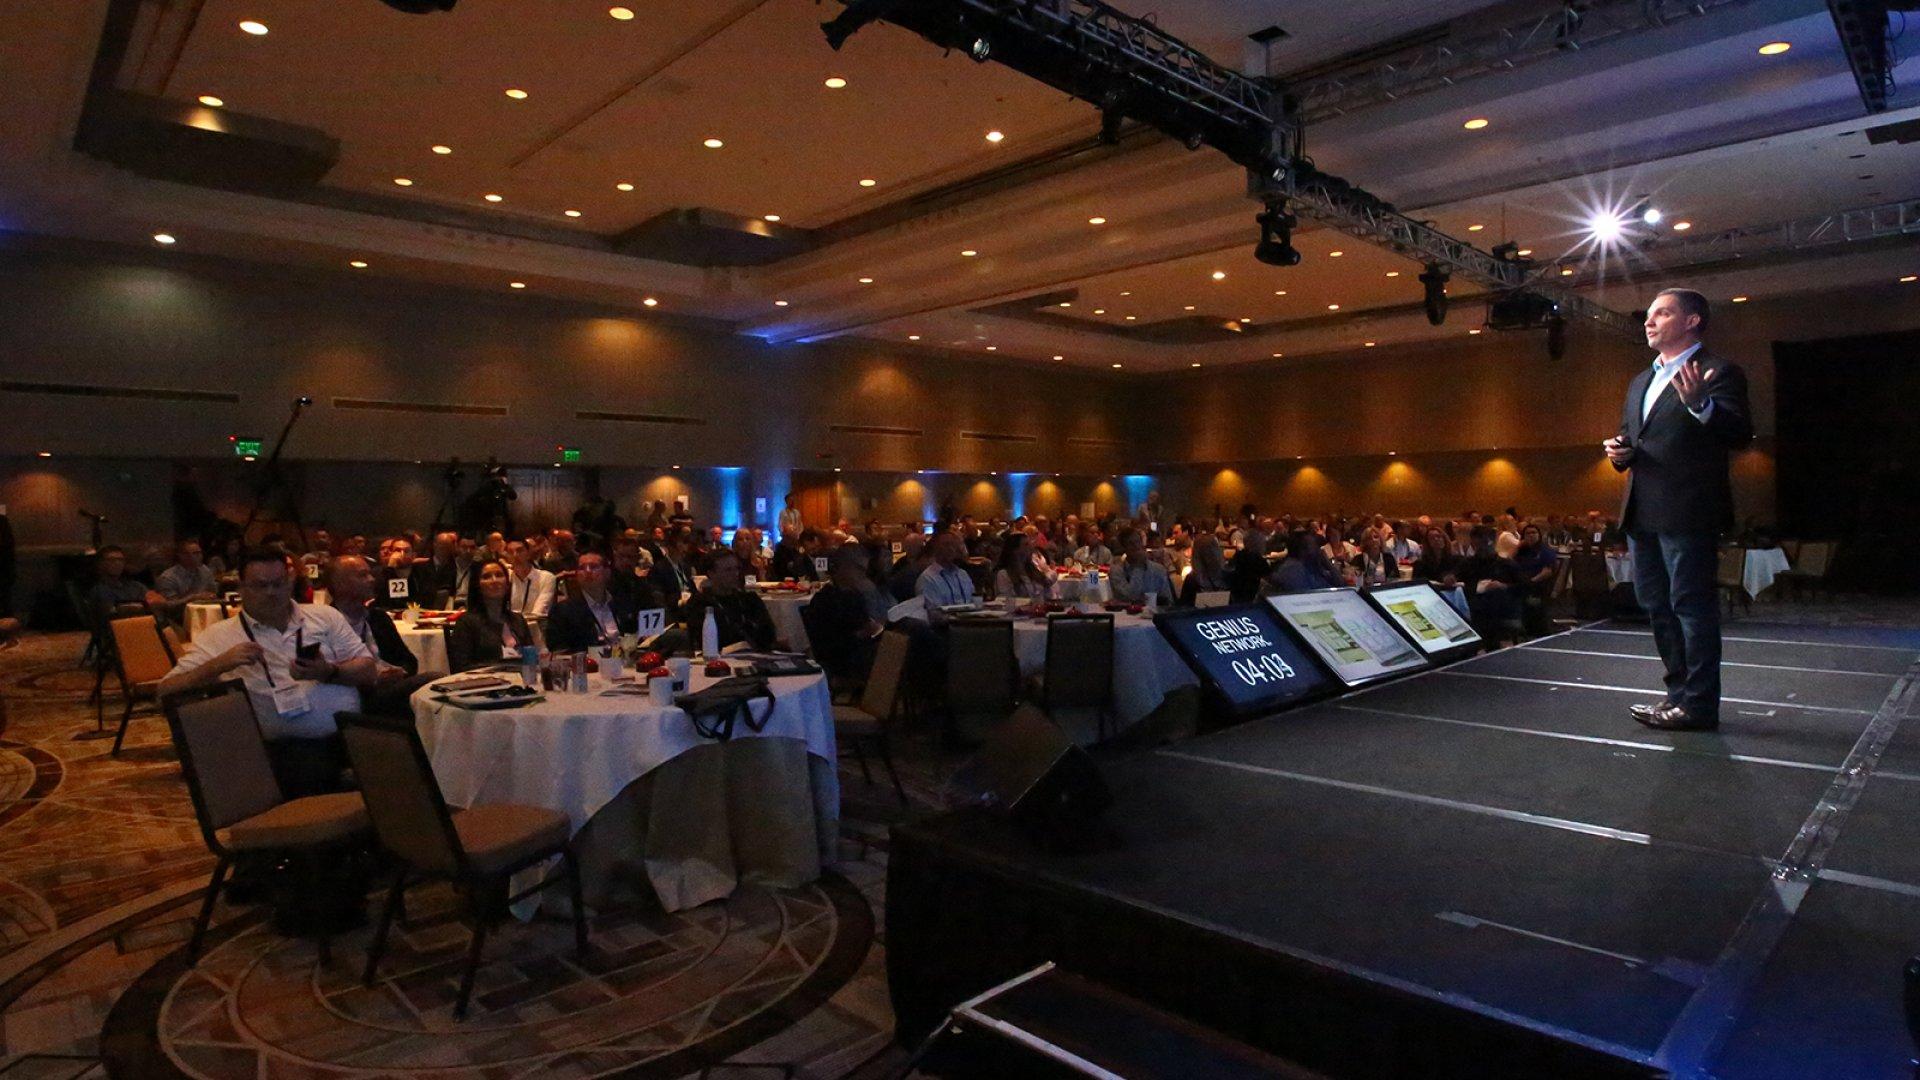 Ryan Deiss talks digital marketing at Genius Network's 2018 event in Arizona